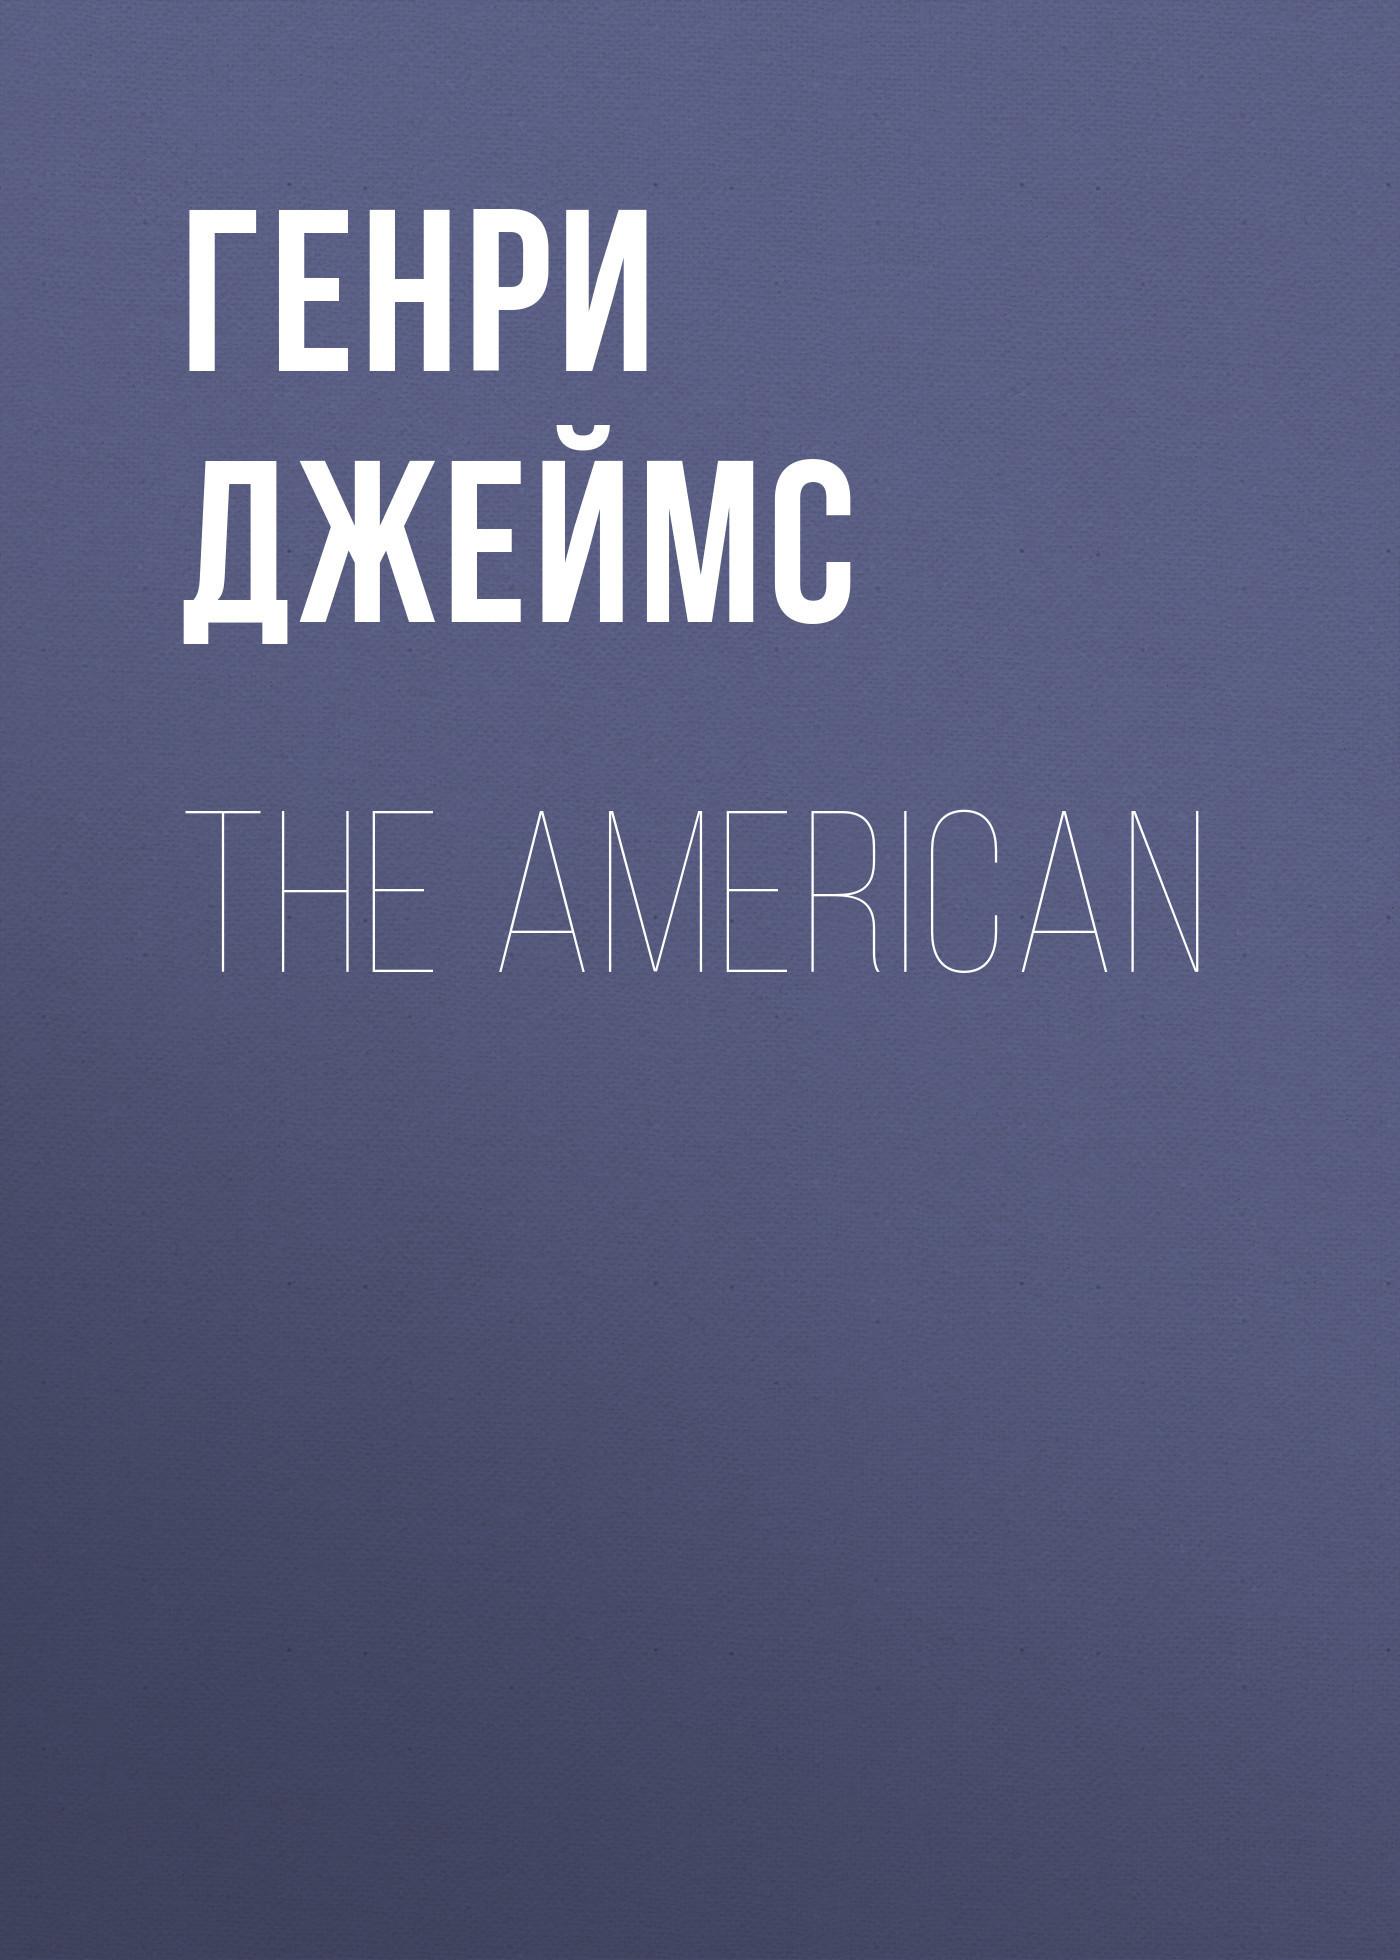 Генри Джеймс The American